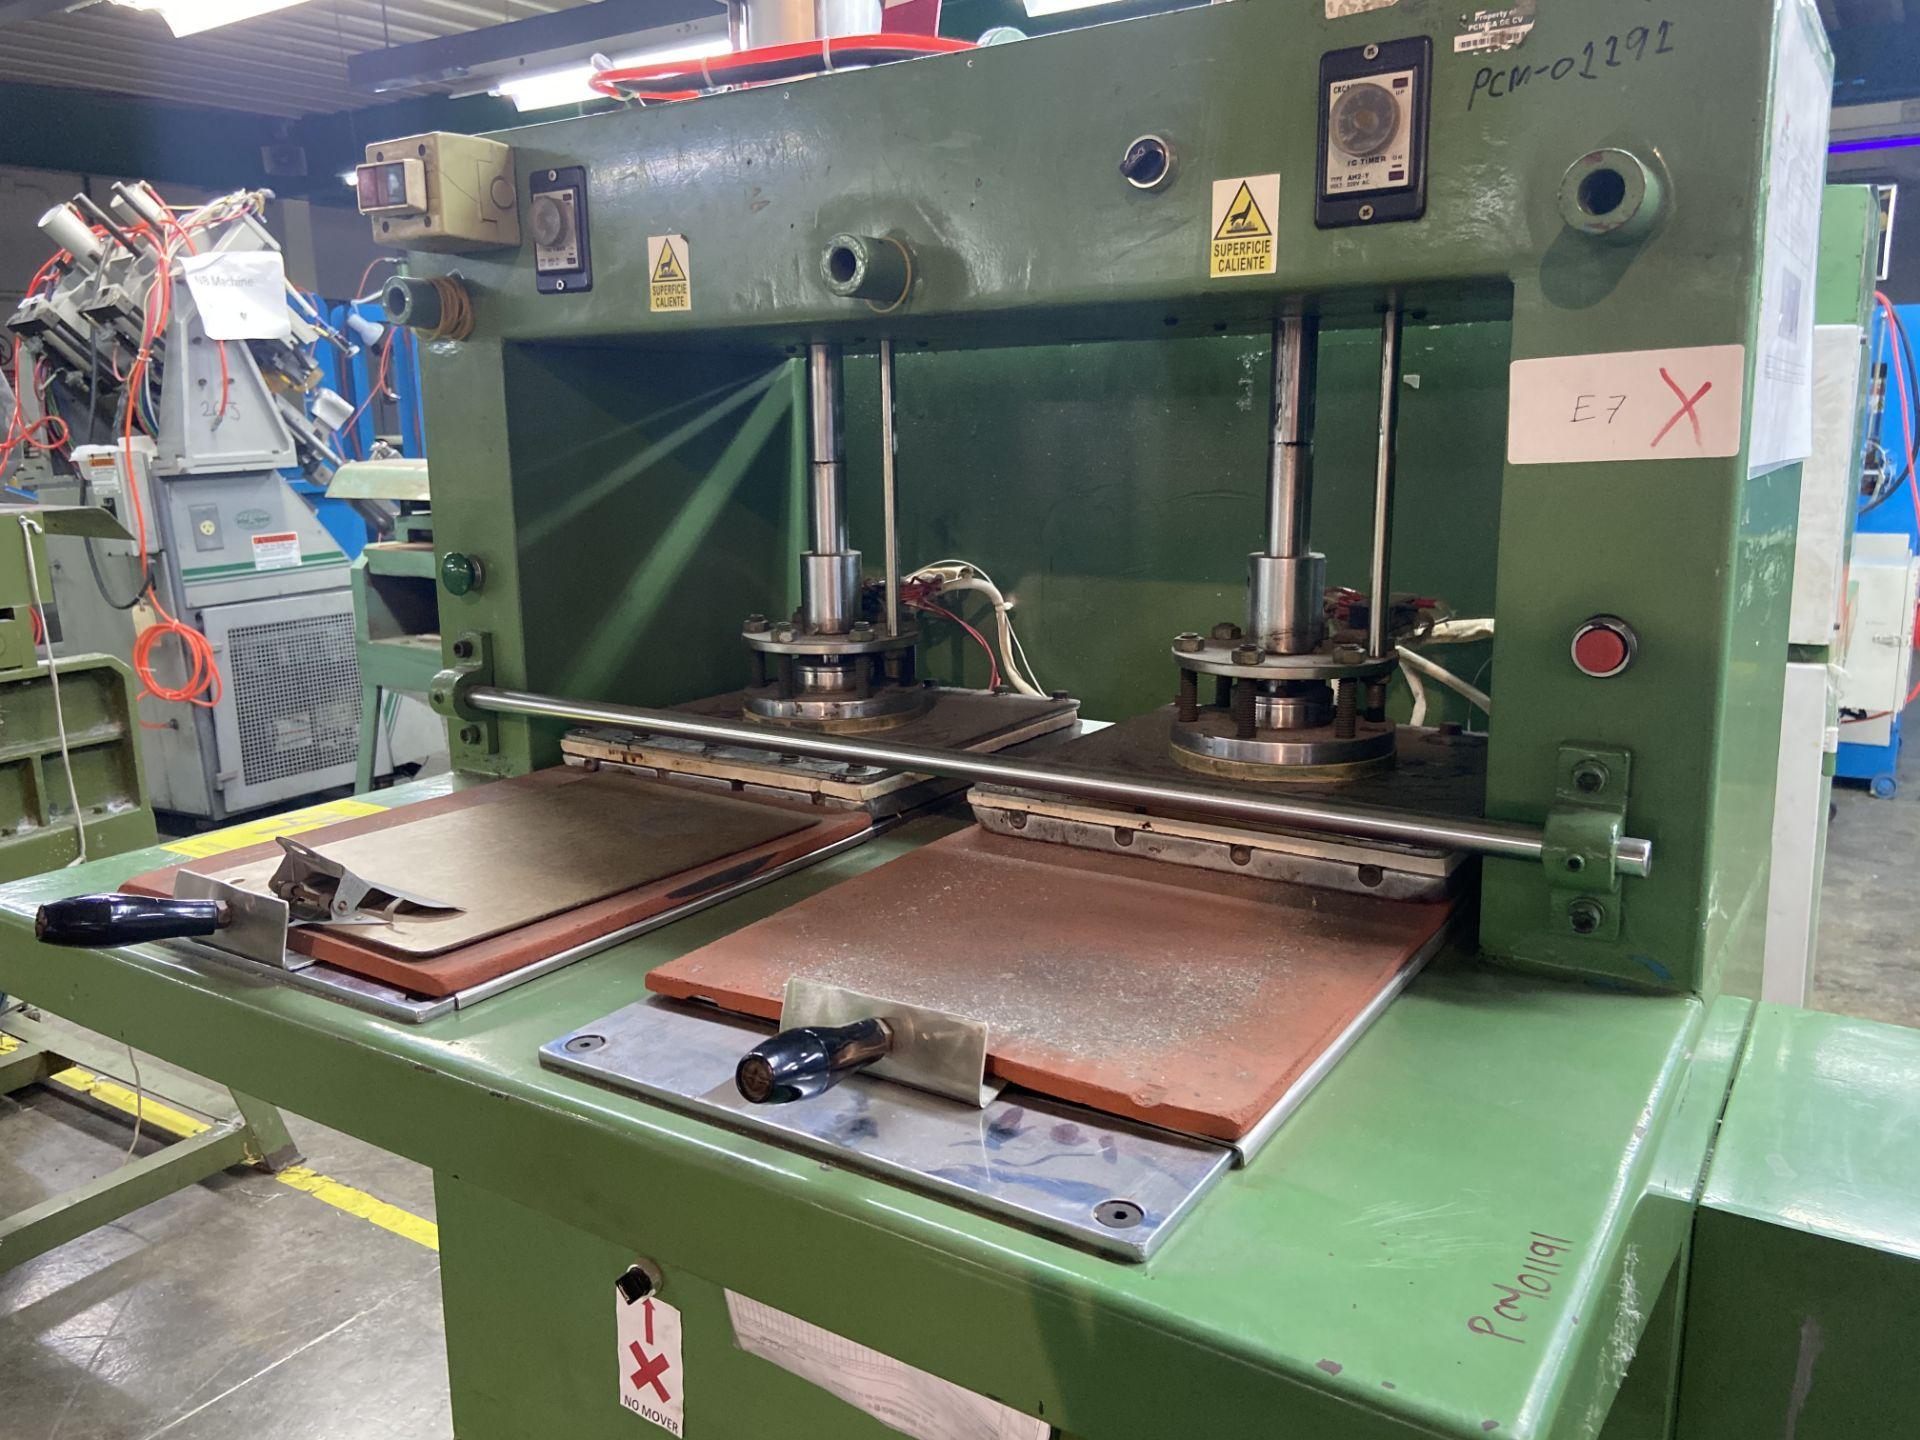 Lot 45 - Prensa neumática de plancha caliente, Activo: PCM01191. Favor de inspeccionar.